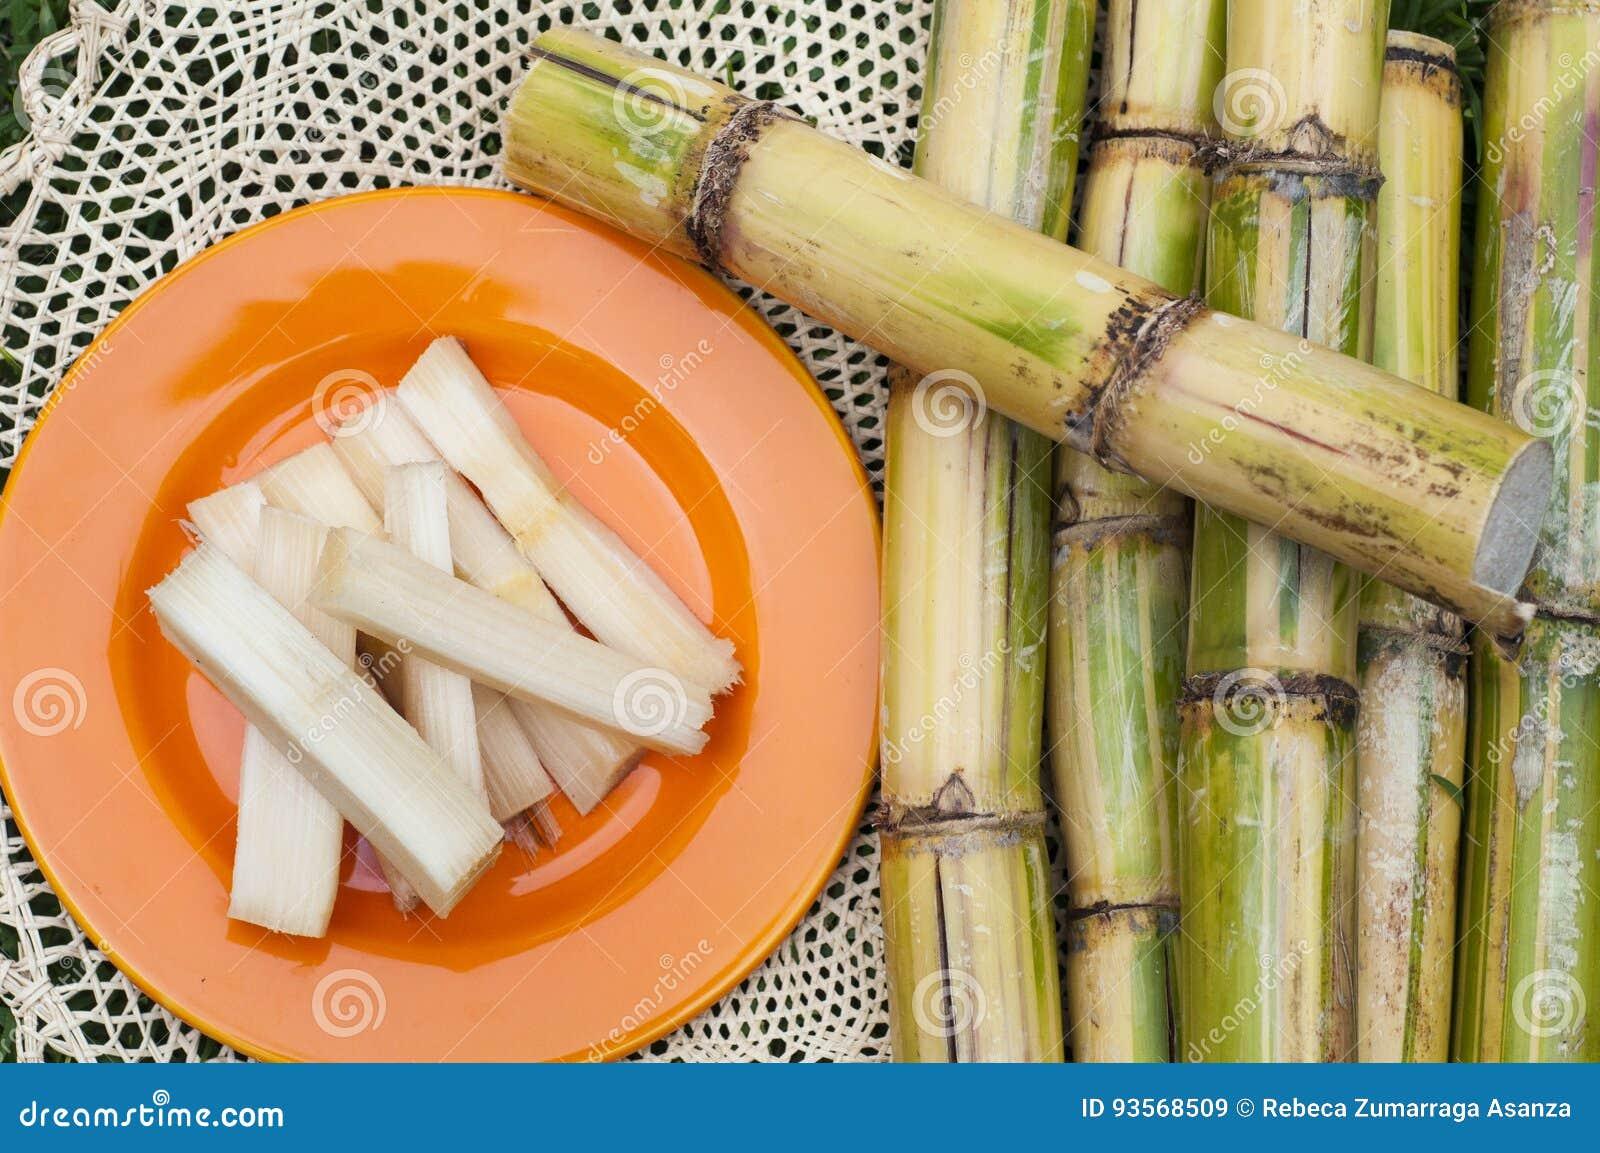 625104d3240b3 Sugar cane stock image. Image of factory, cuban, brazil - 93568509